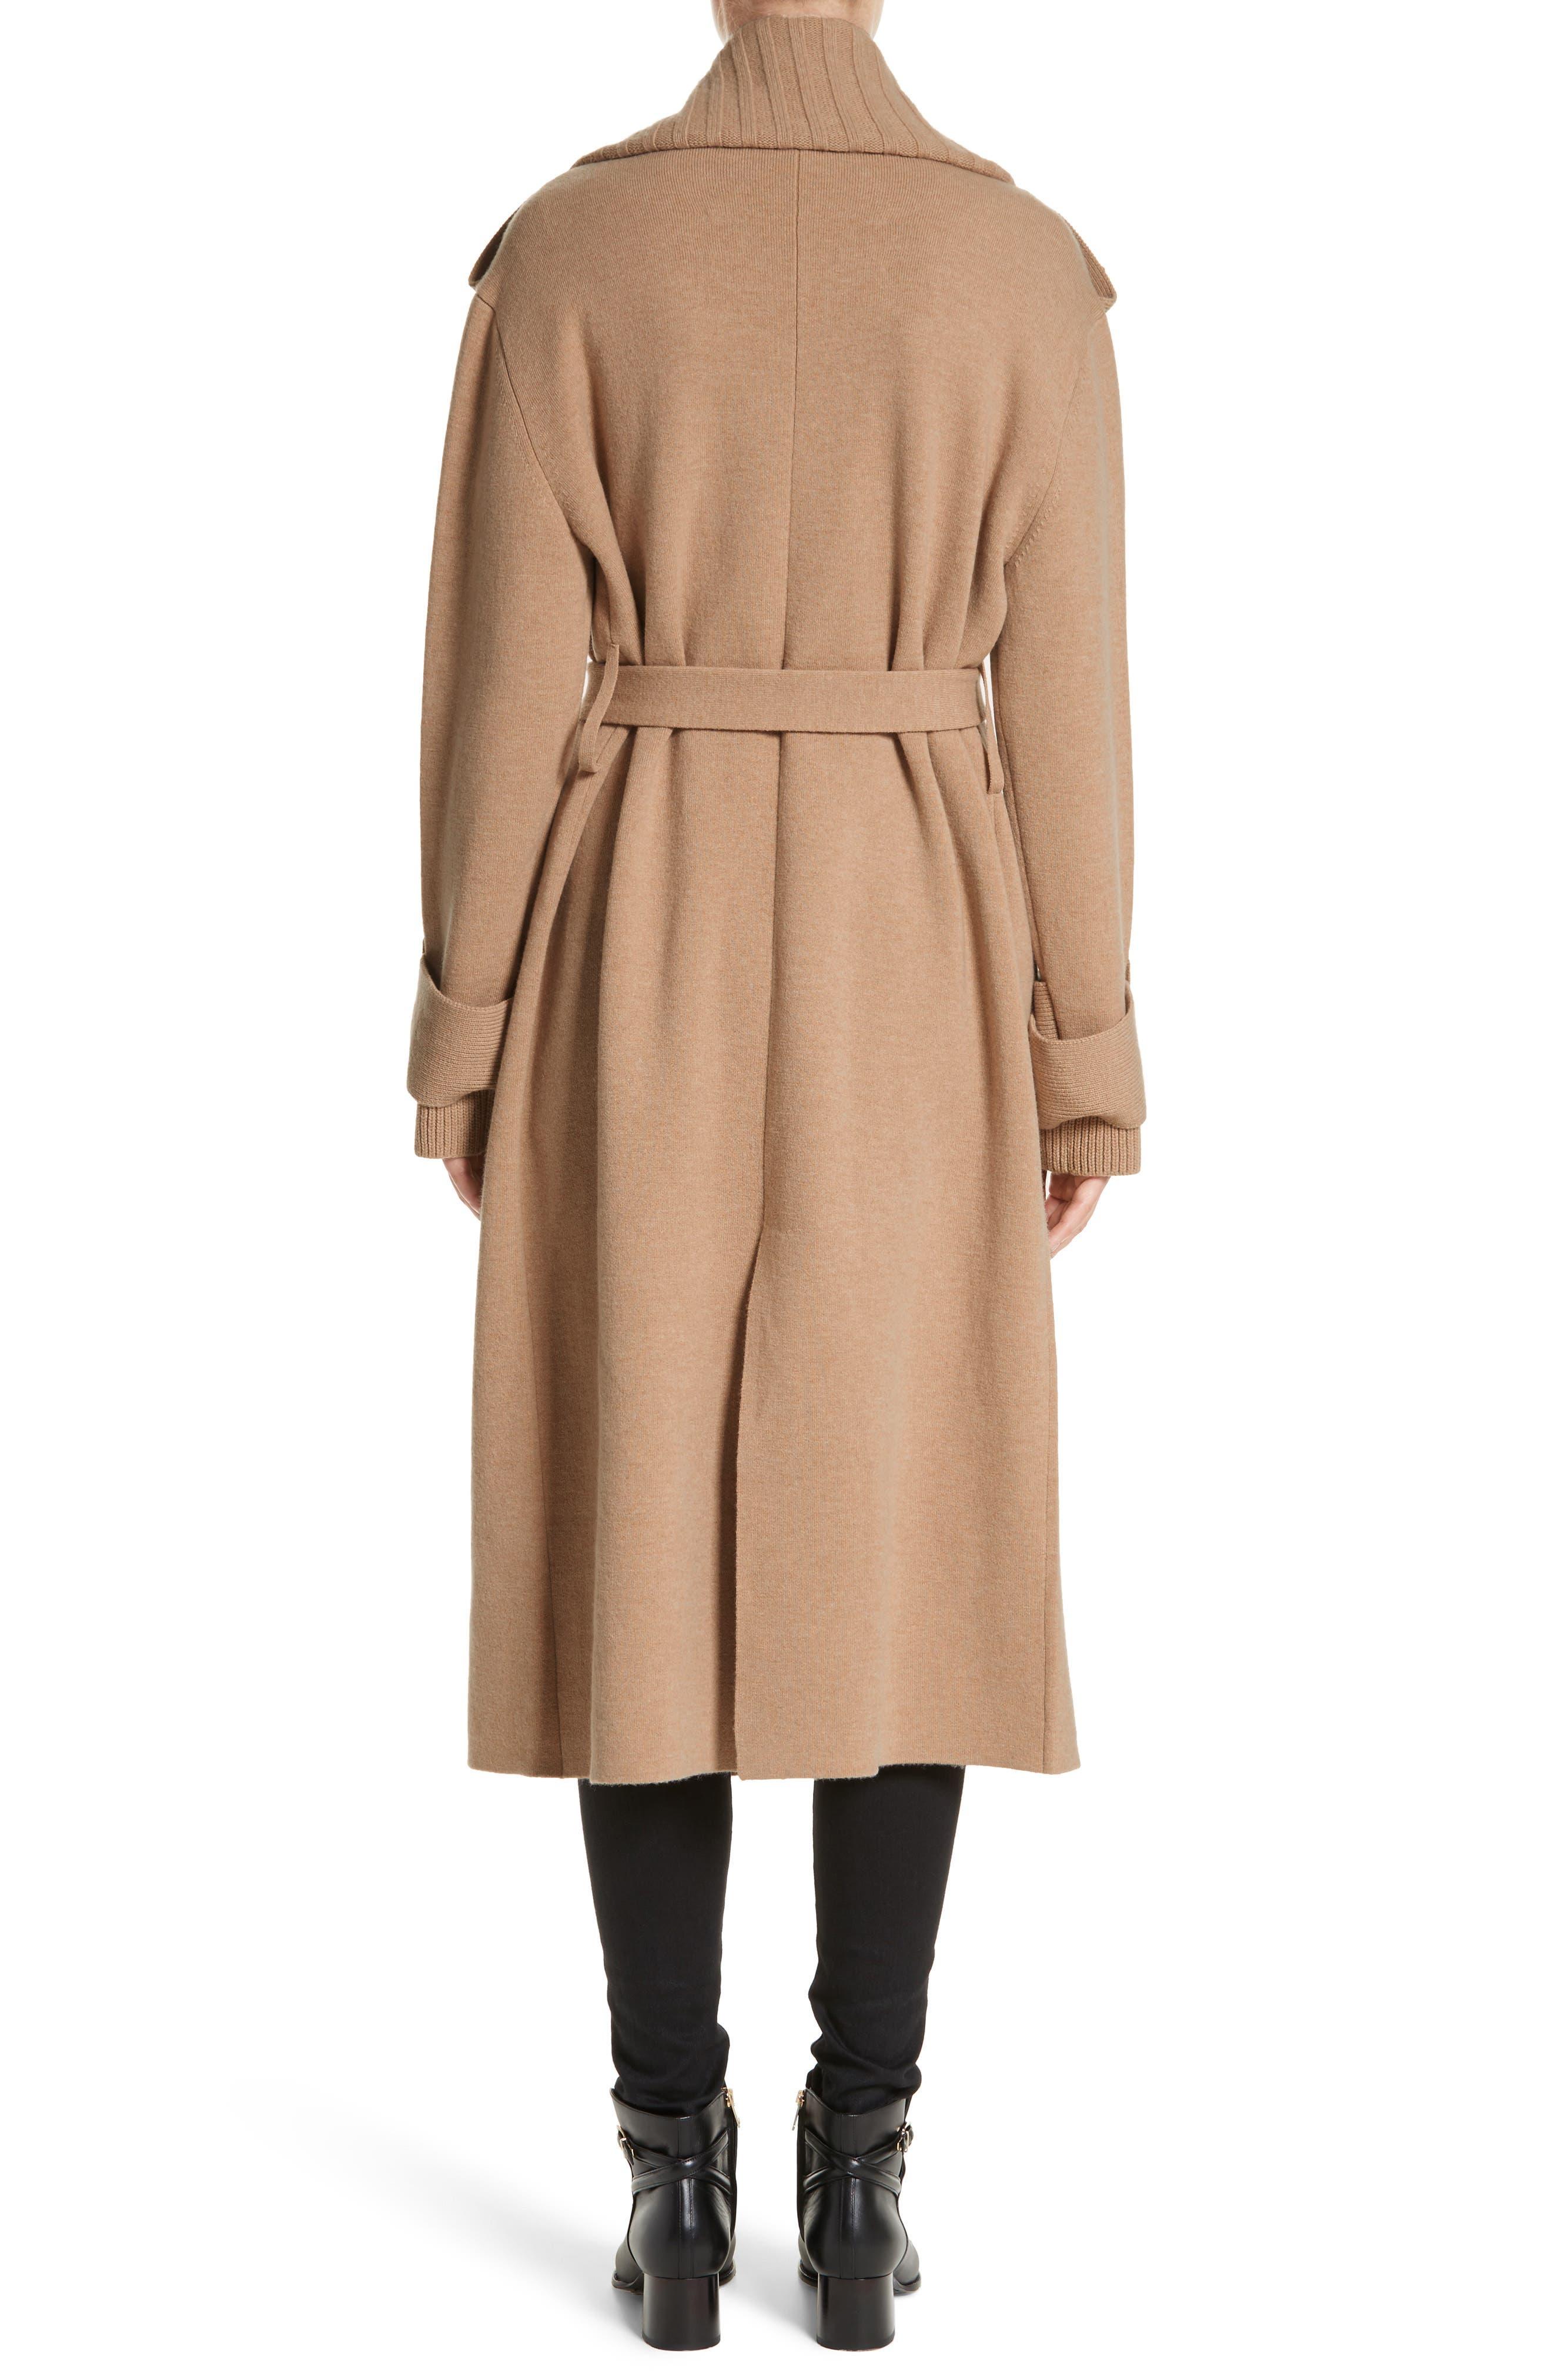 Piota Wool Blend Knit Trench Coat,                             Alternate thumbnail 2, color,                             Camel